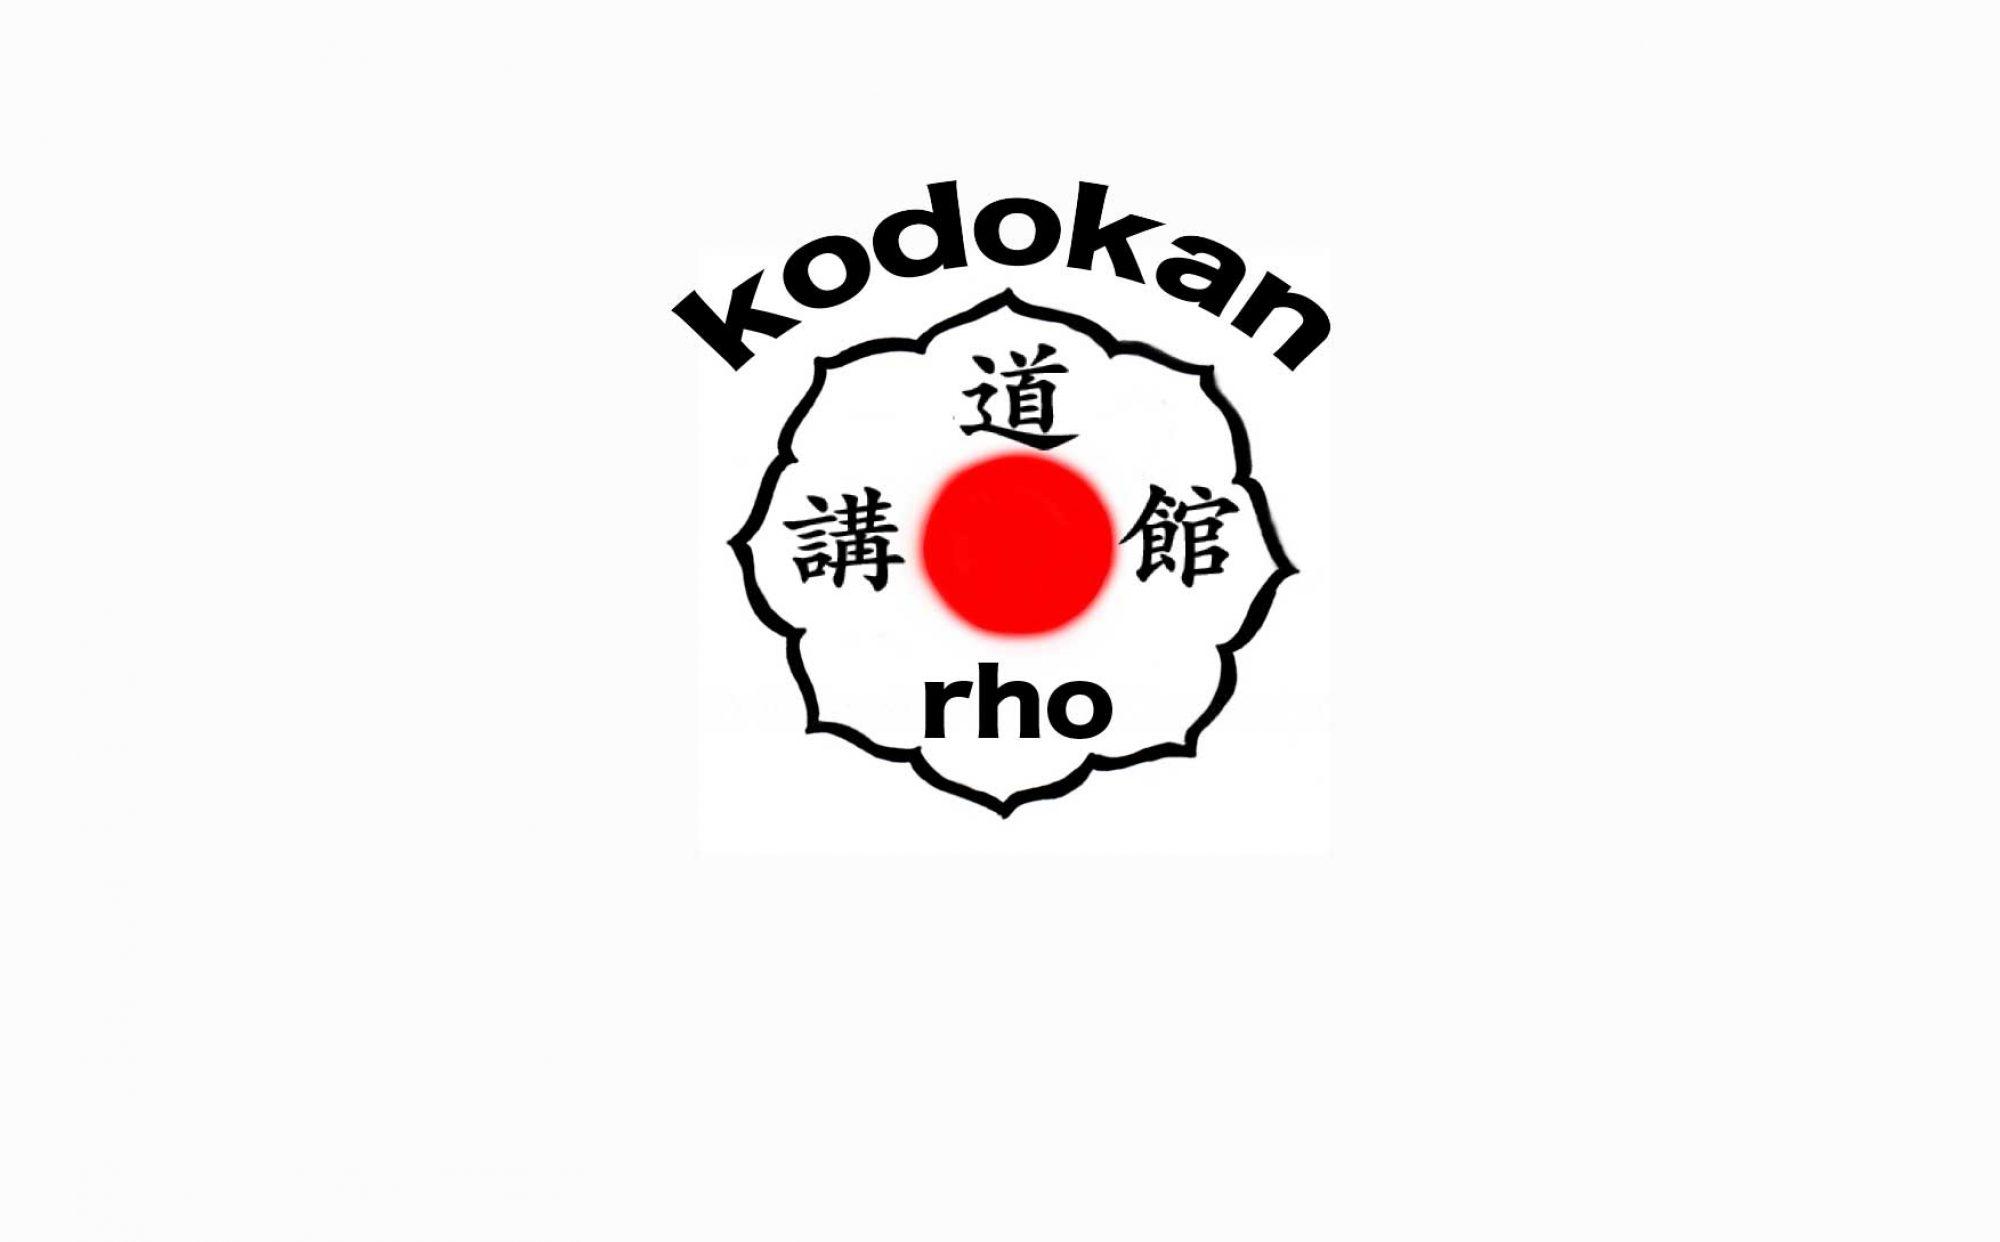 Kodokan Rho